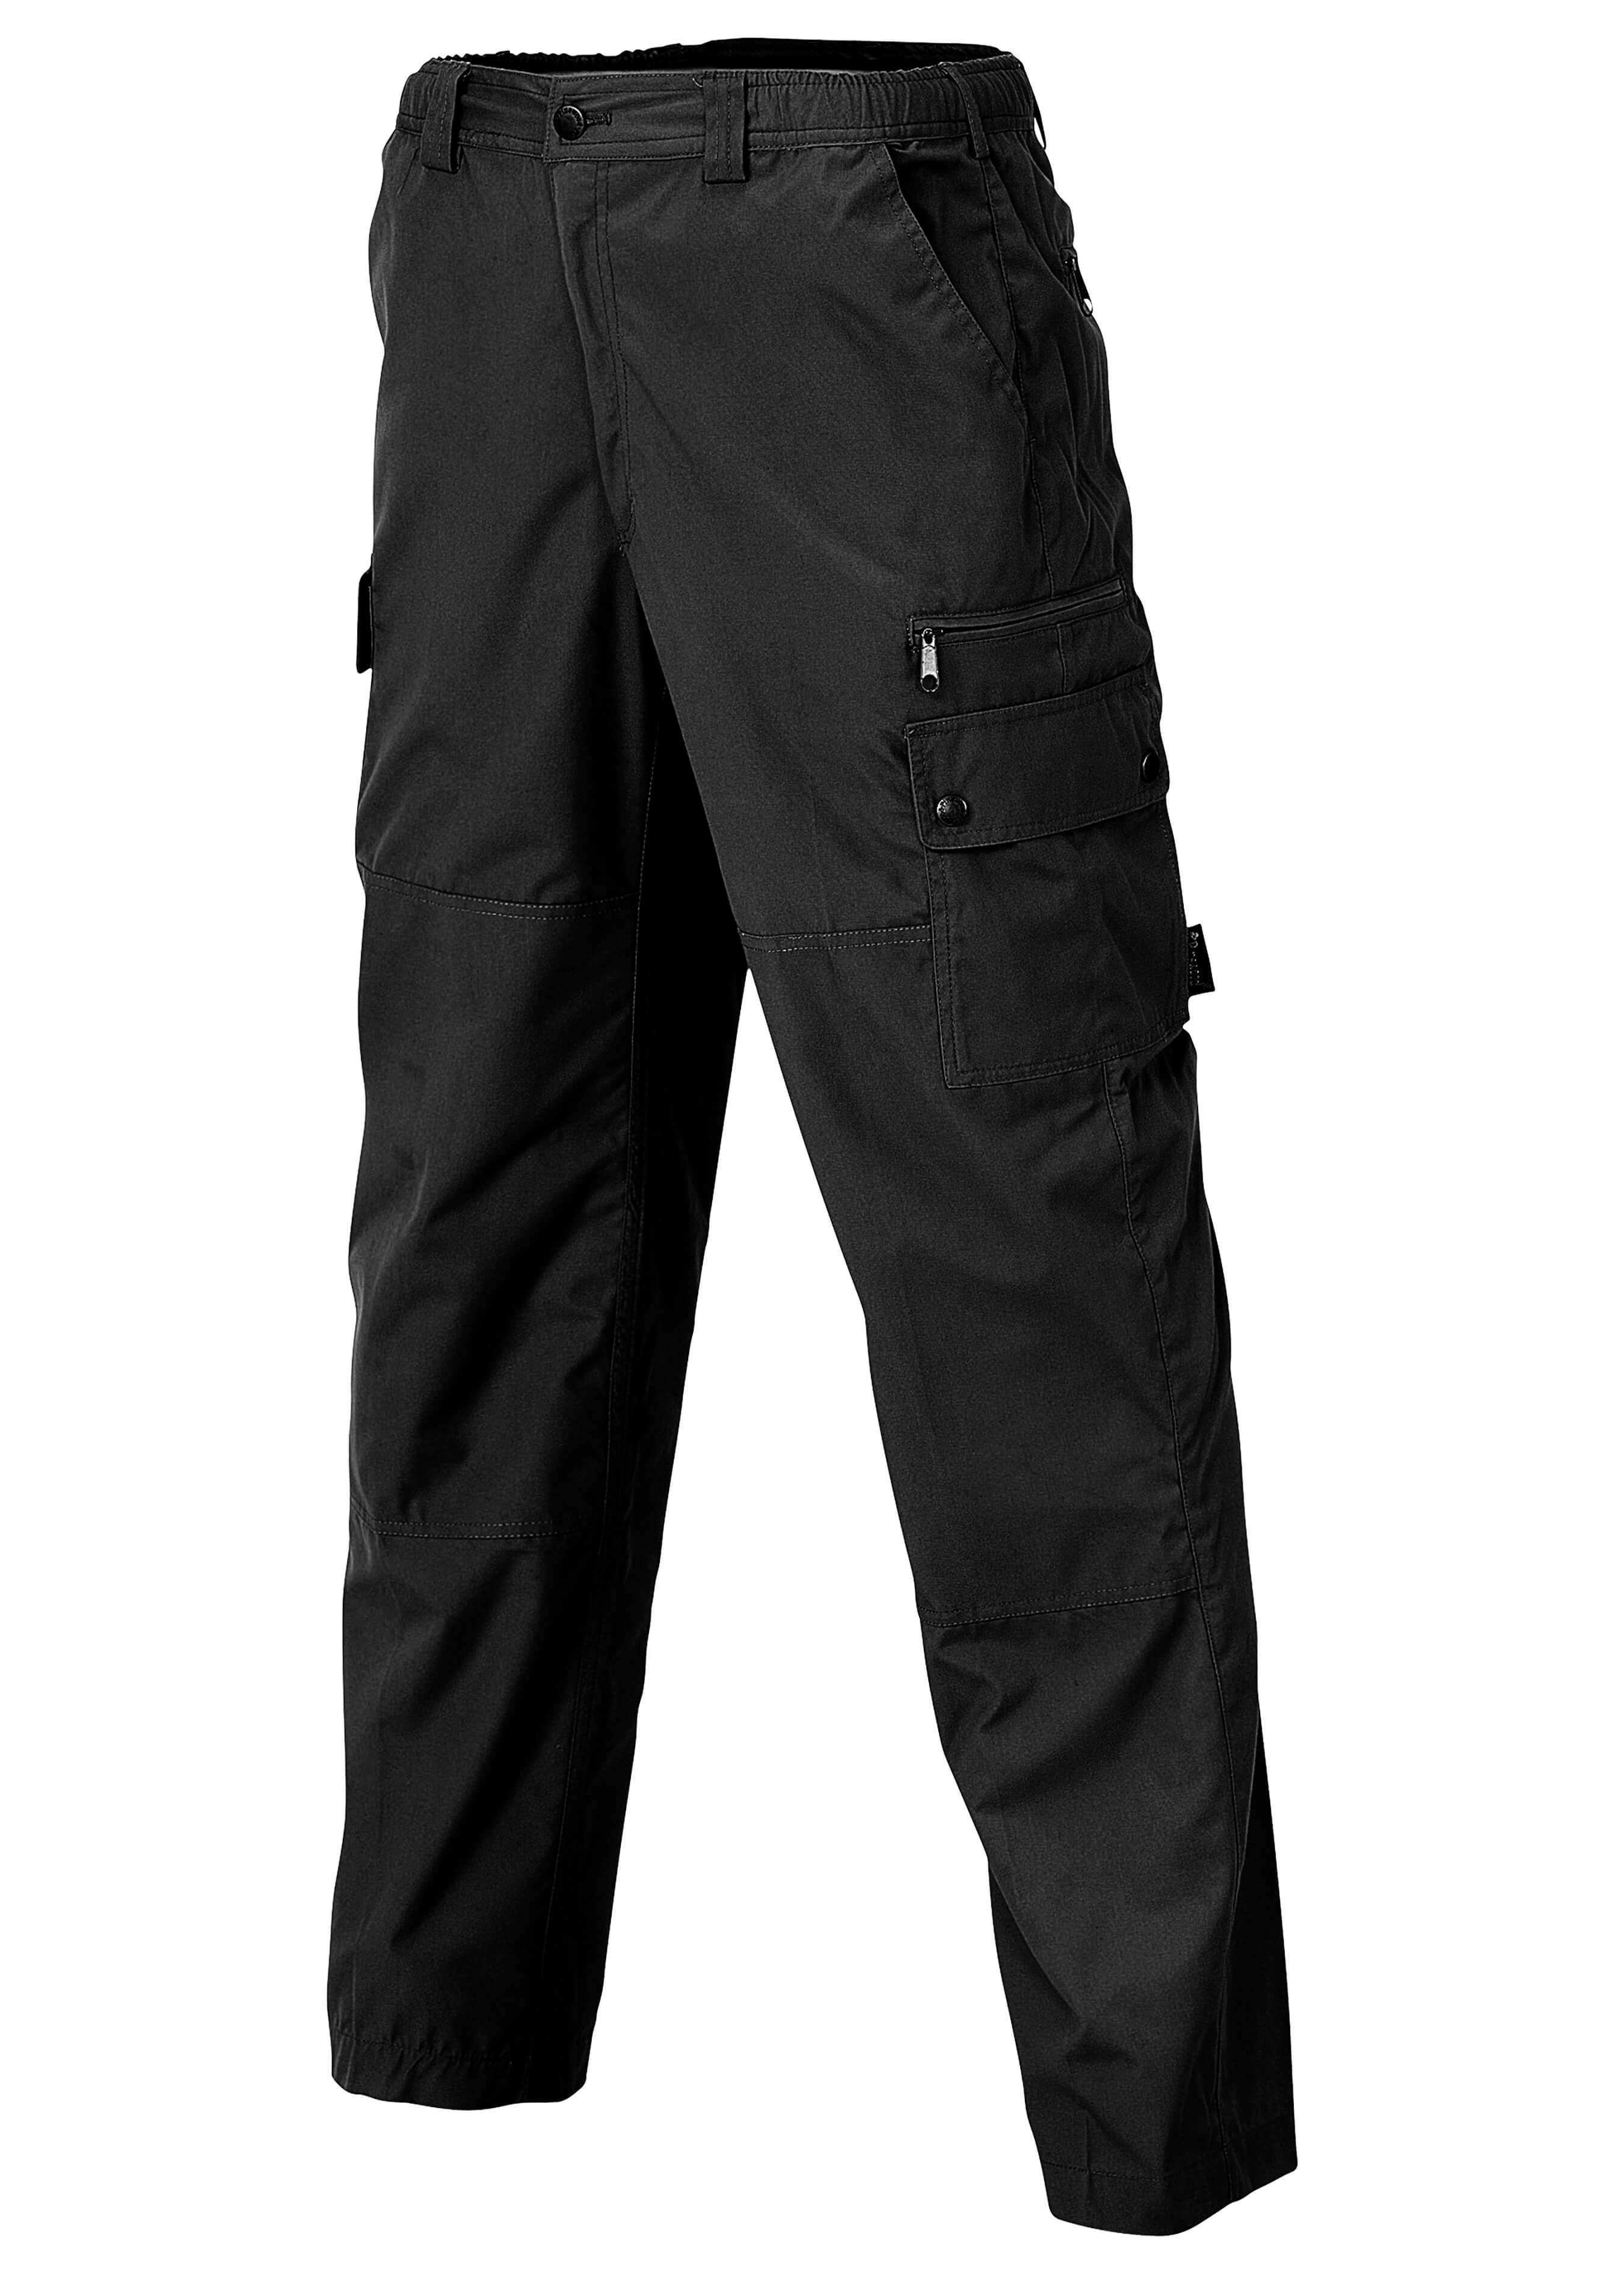 Pantalon thermo polyvalent Wildmark (9080) 28201046 1